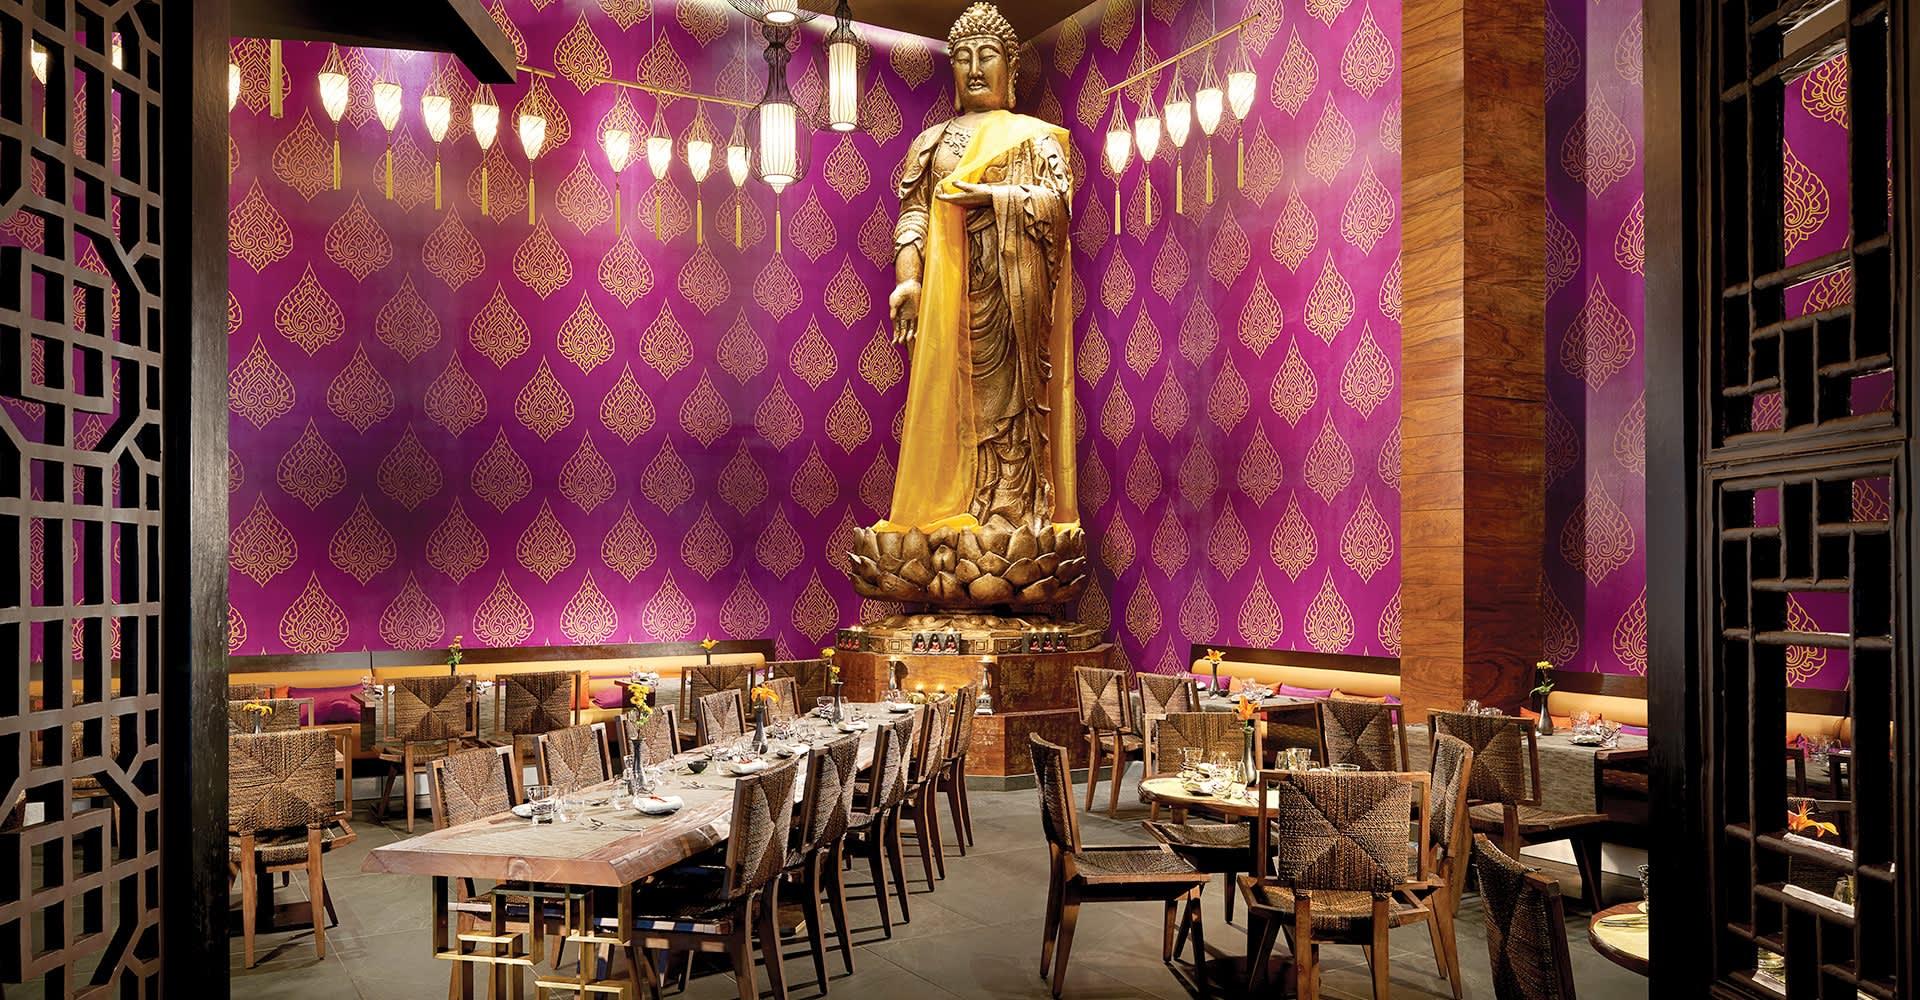 Koh Thai Restauarant at The Fives Beach Hotel, Playa del Carmen